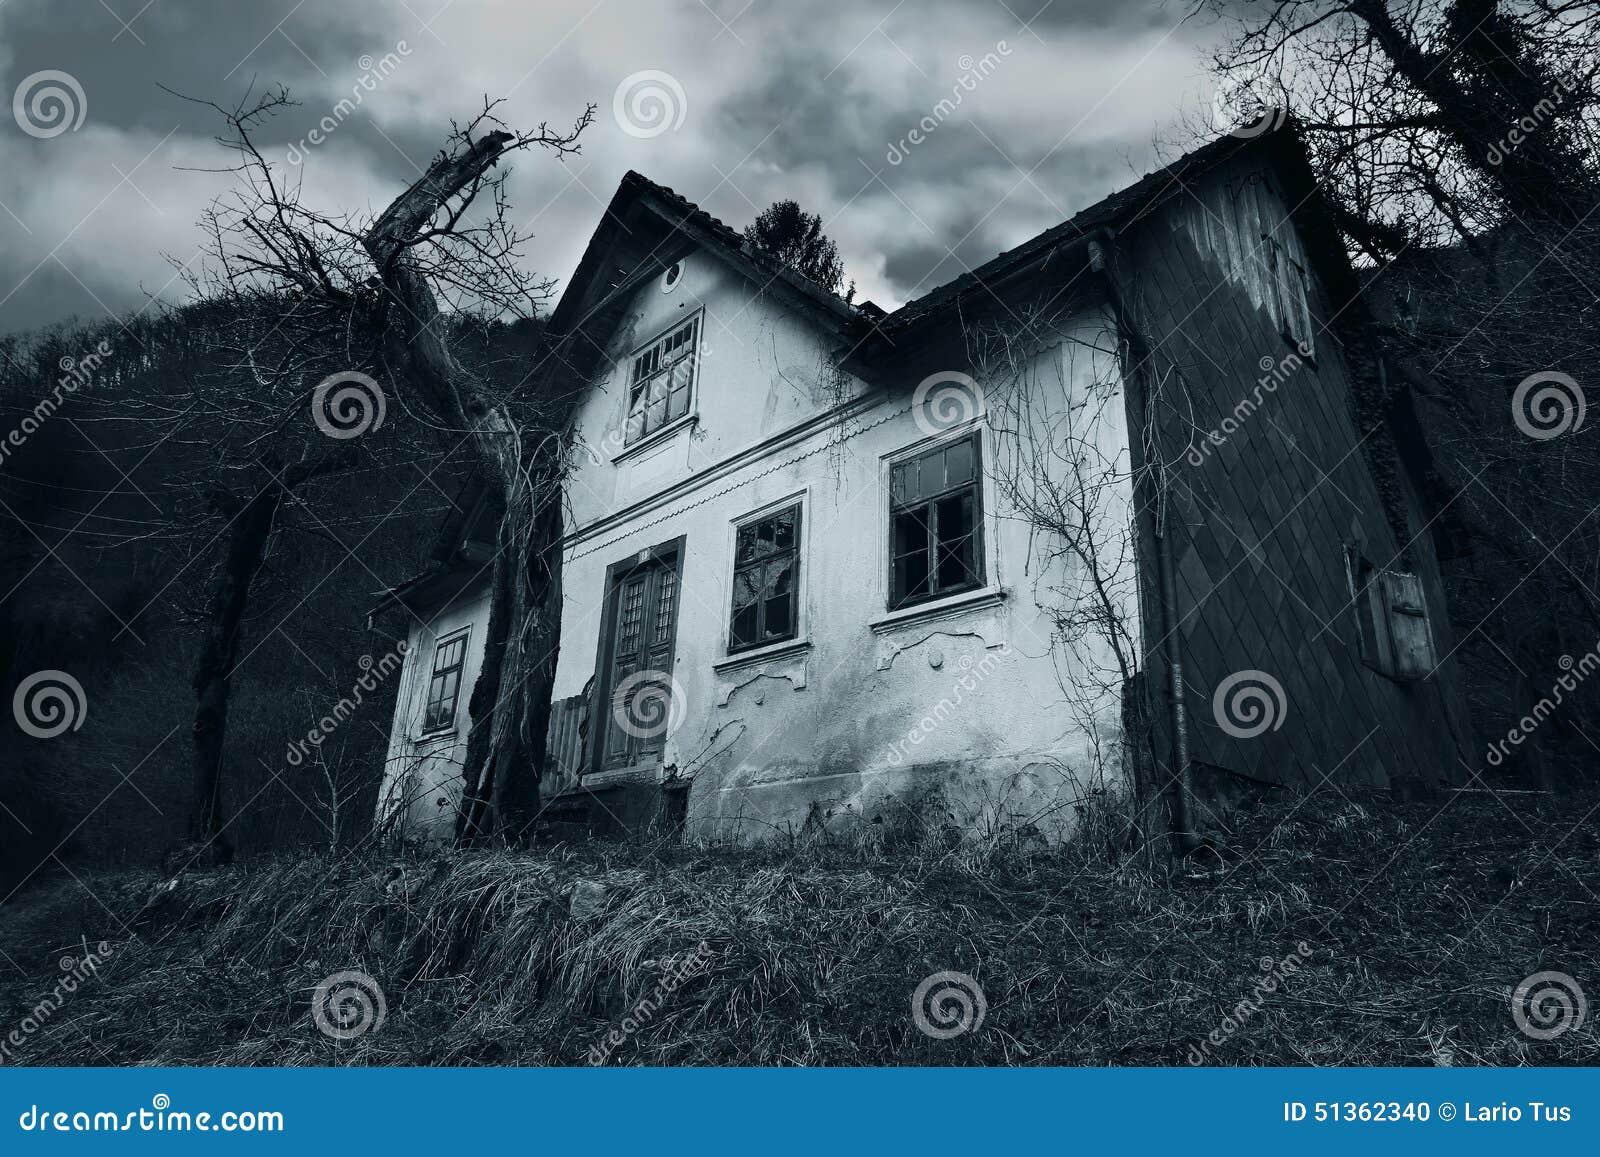 Horrorszene eines verlassenen Hauses